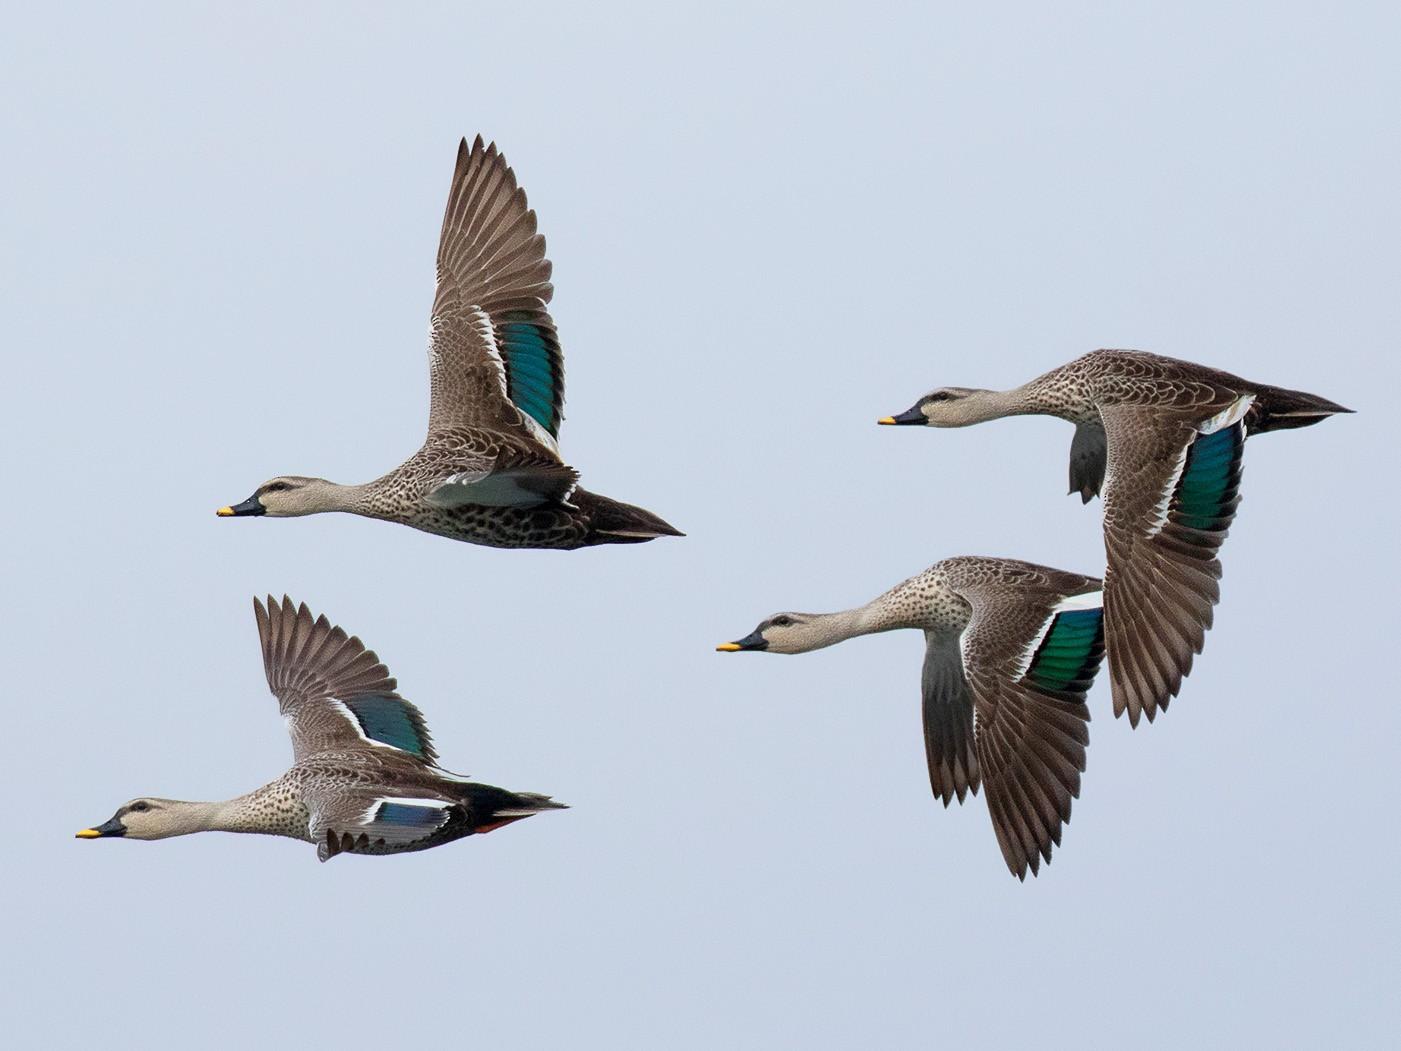 Indian Spot-billed Duck - Ayuwat Jearwattanakanok